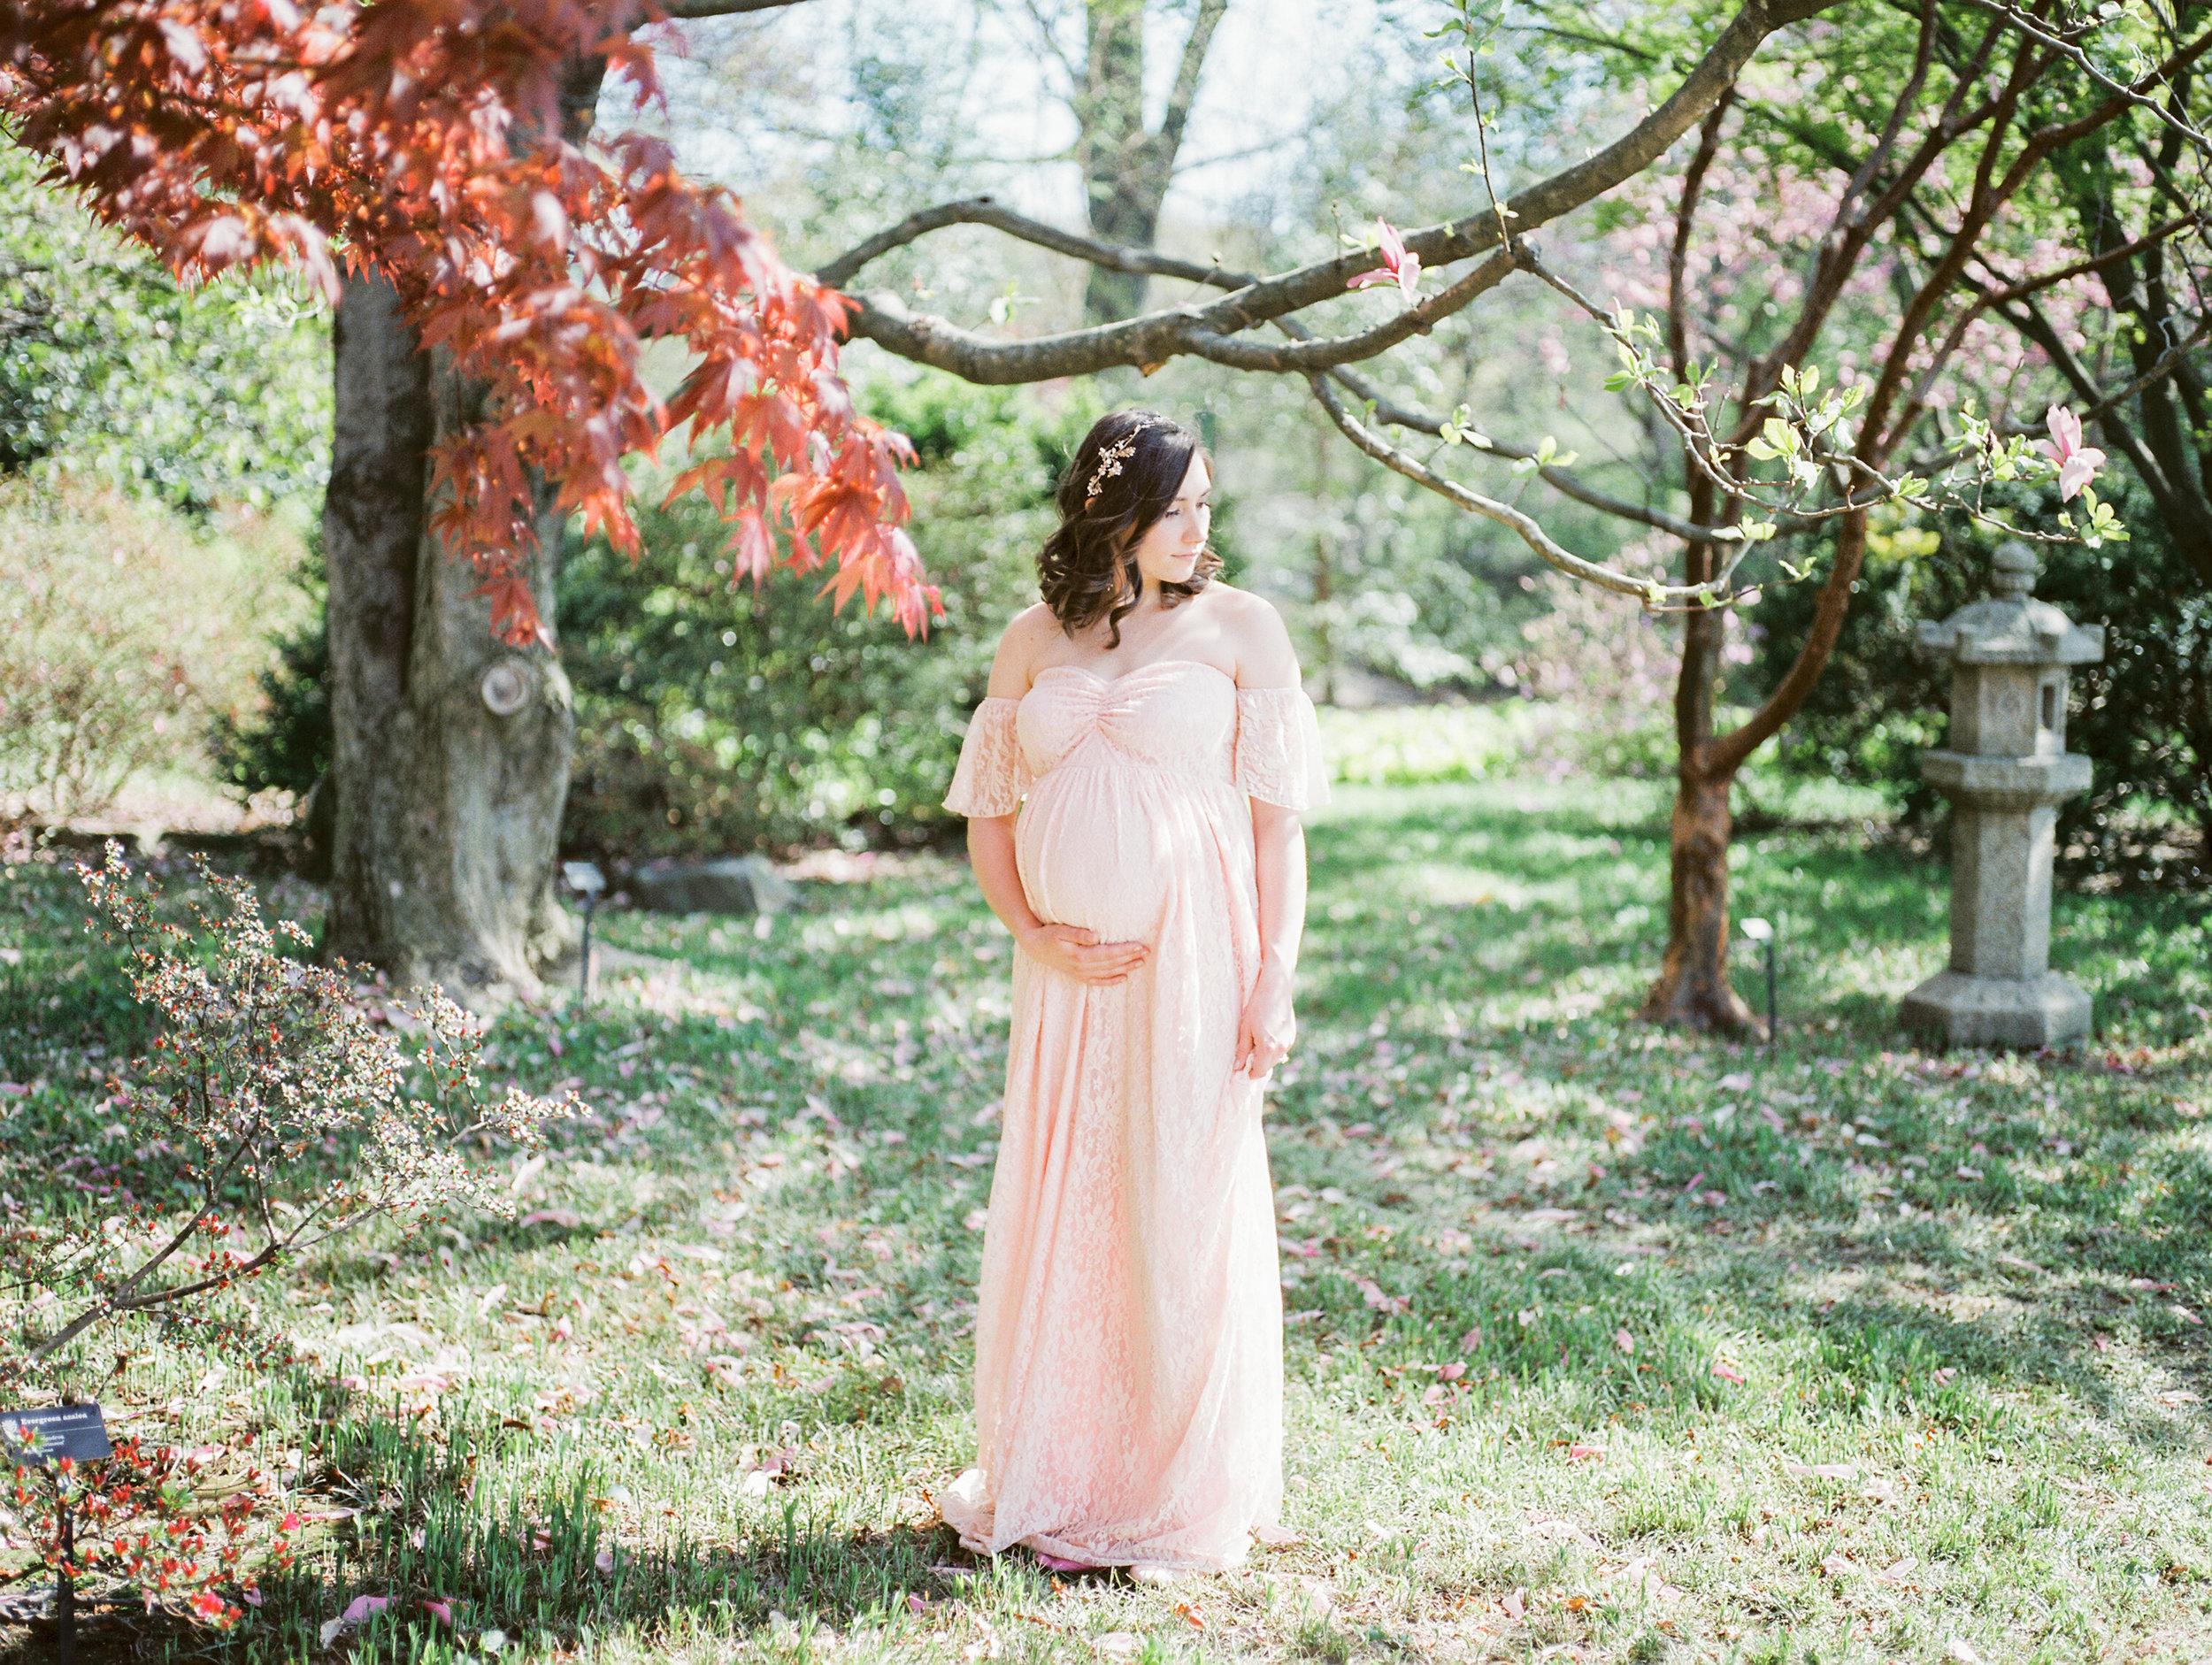 dorothy-louise-photography-Missouri-botanical-garden-maternity-006.jpg